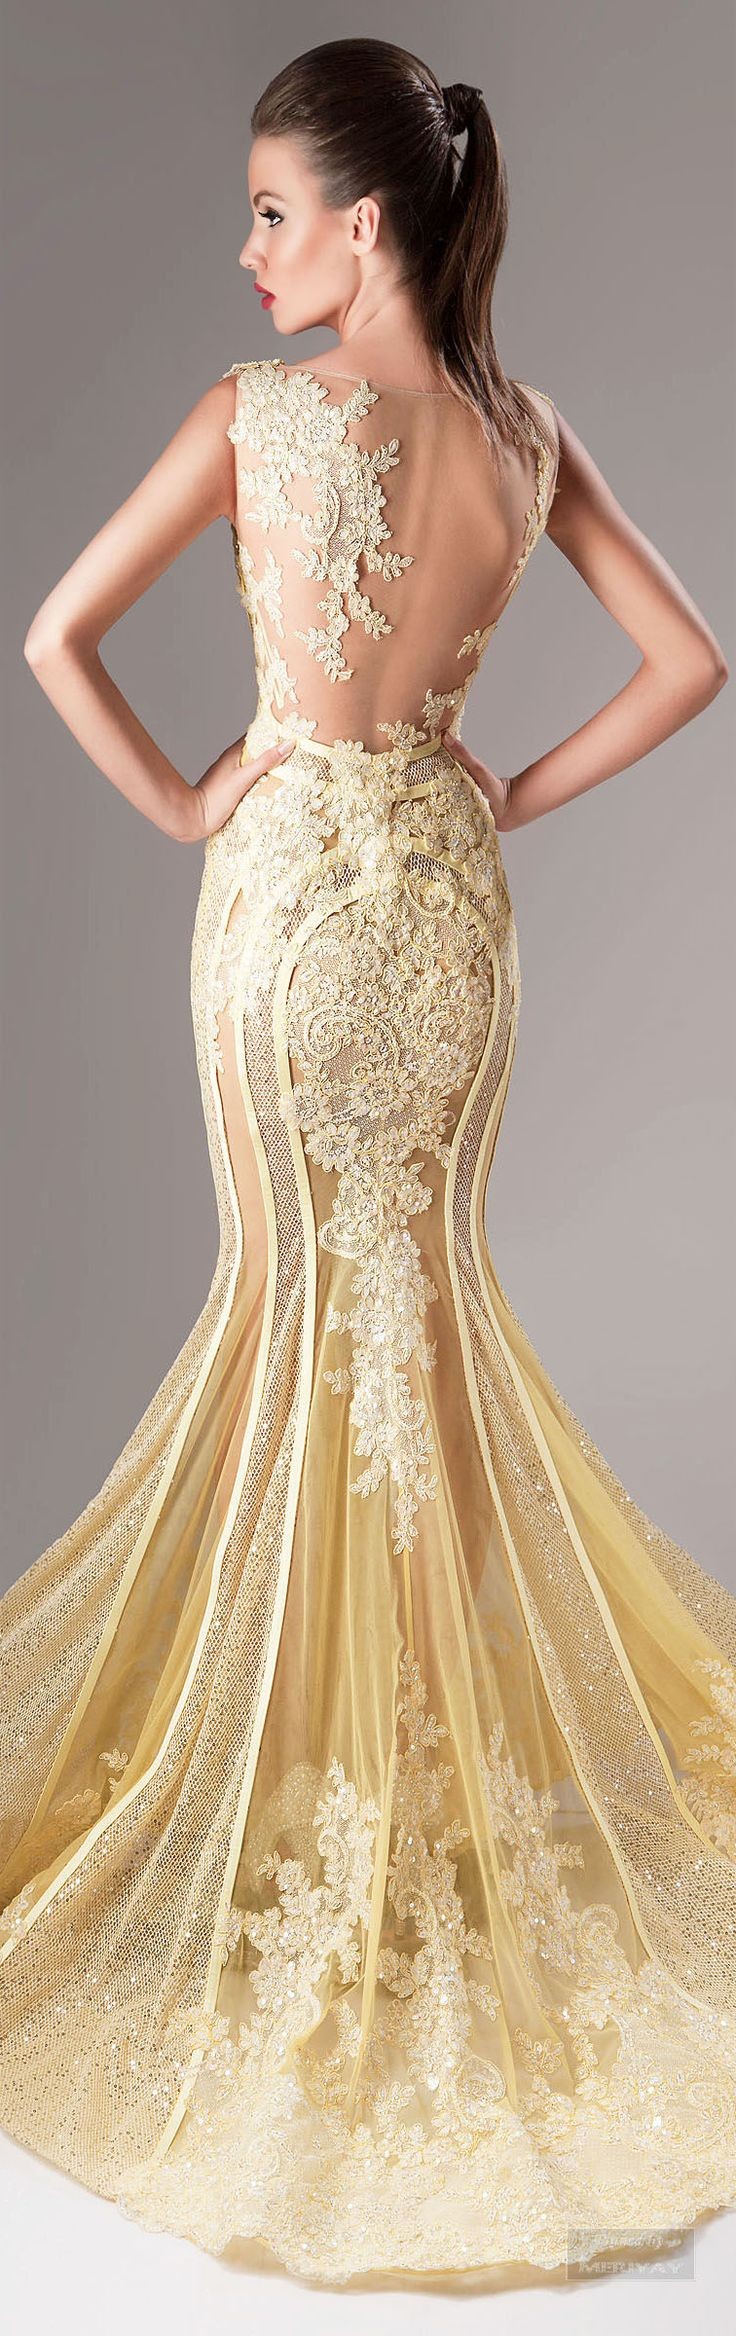 Stunning dress!!!